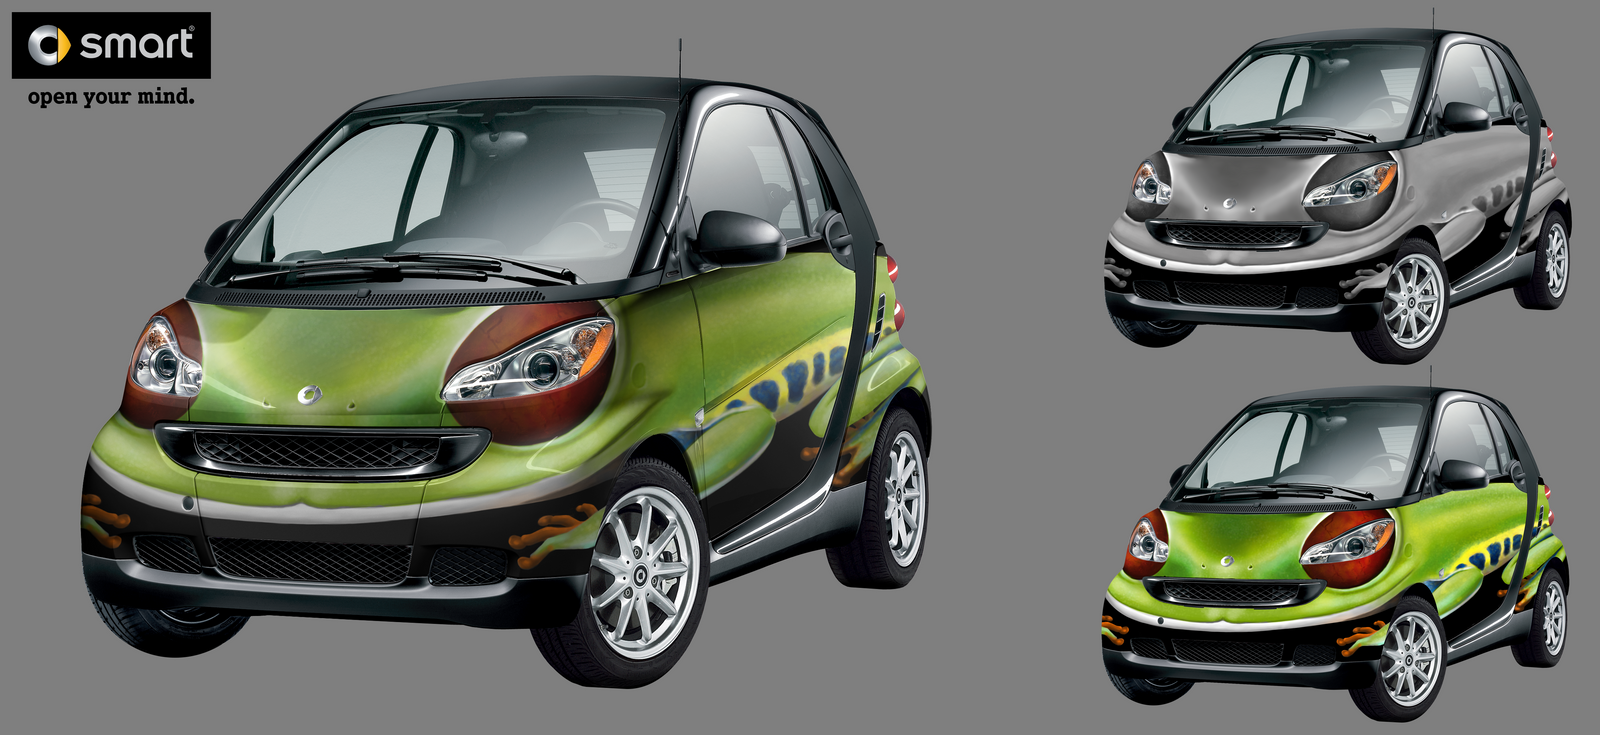 Frog Car - SmartCar entry 2 by Xeraki